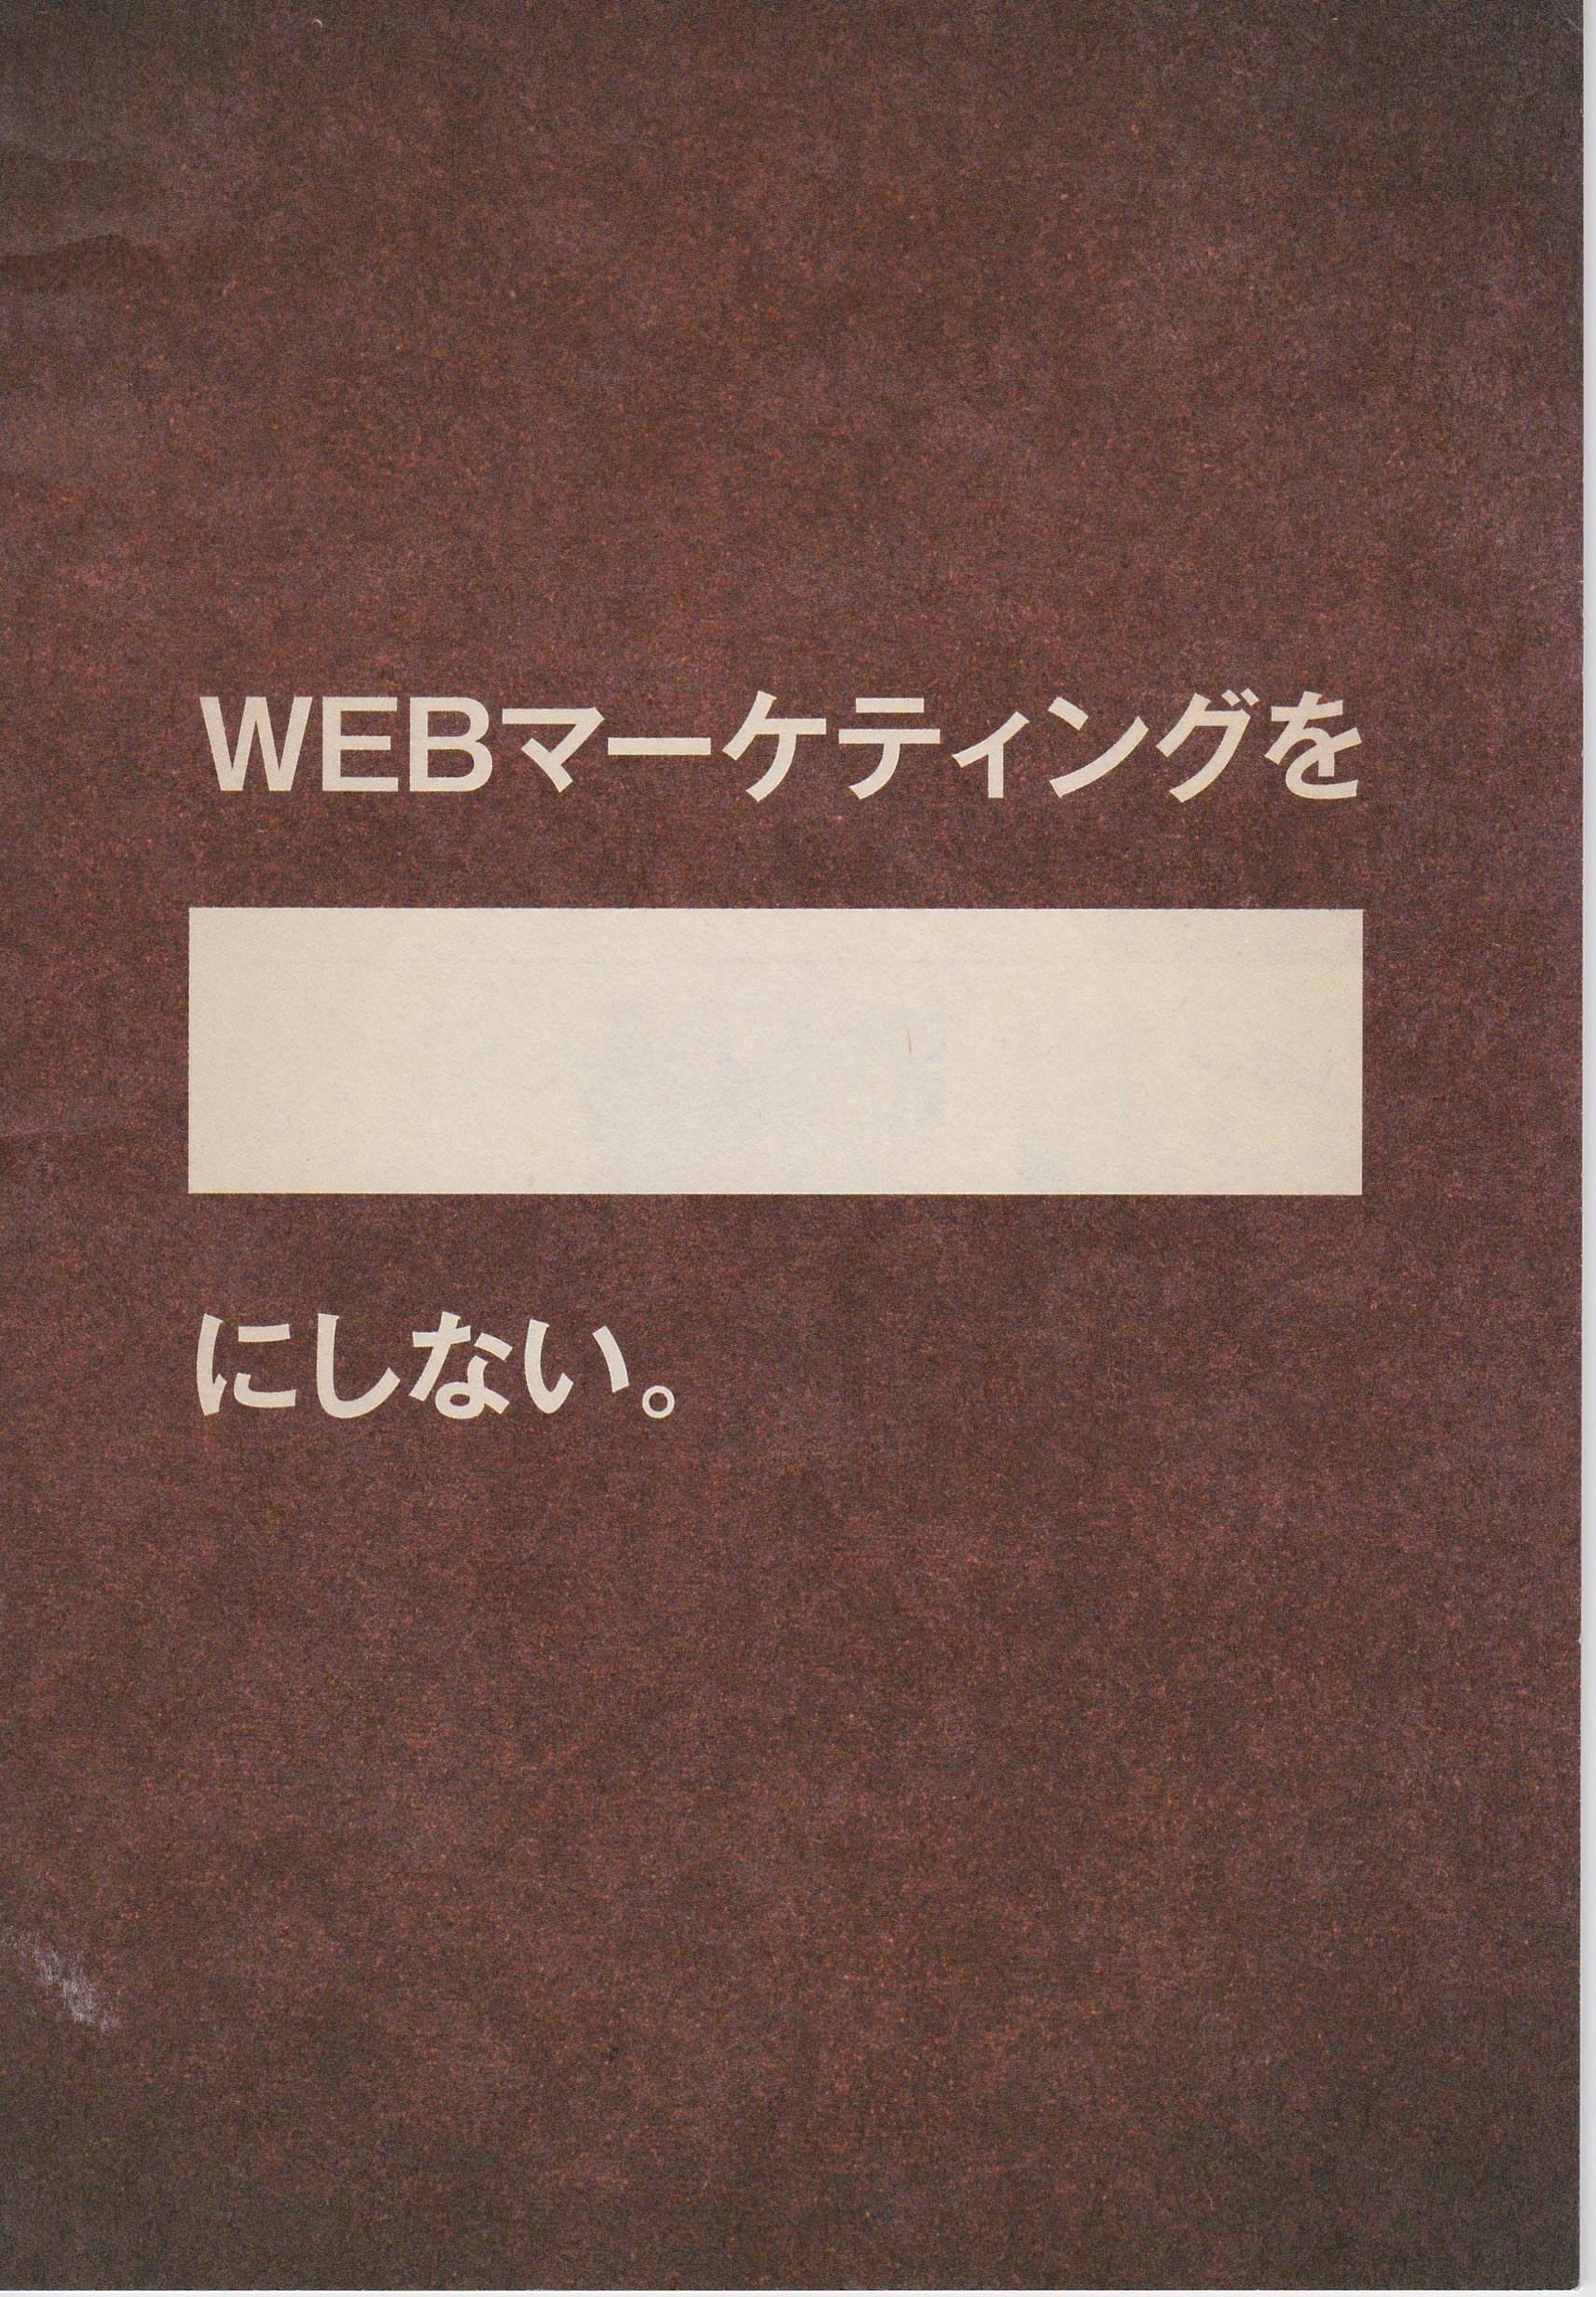 WEBマーケティングを